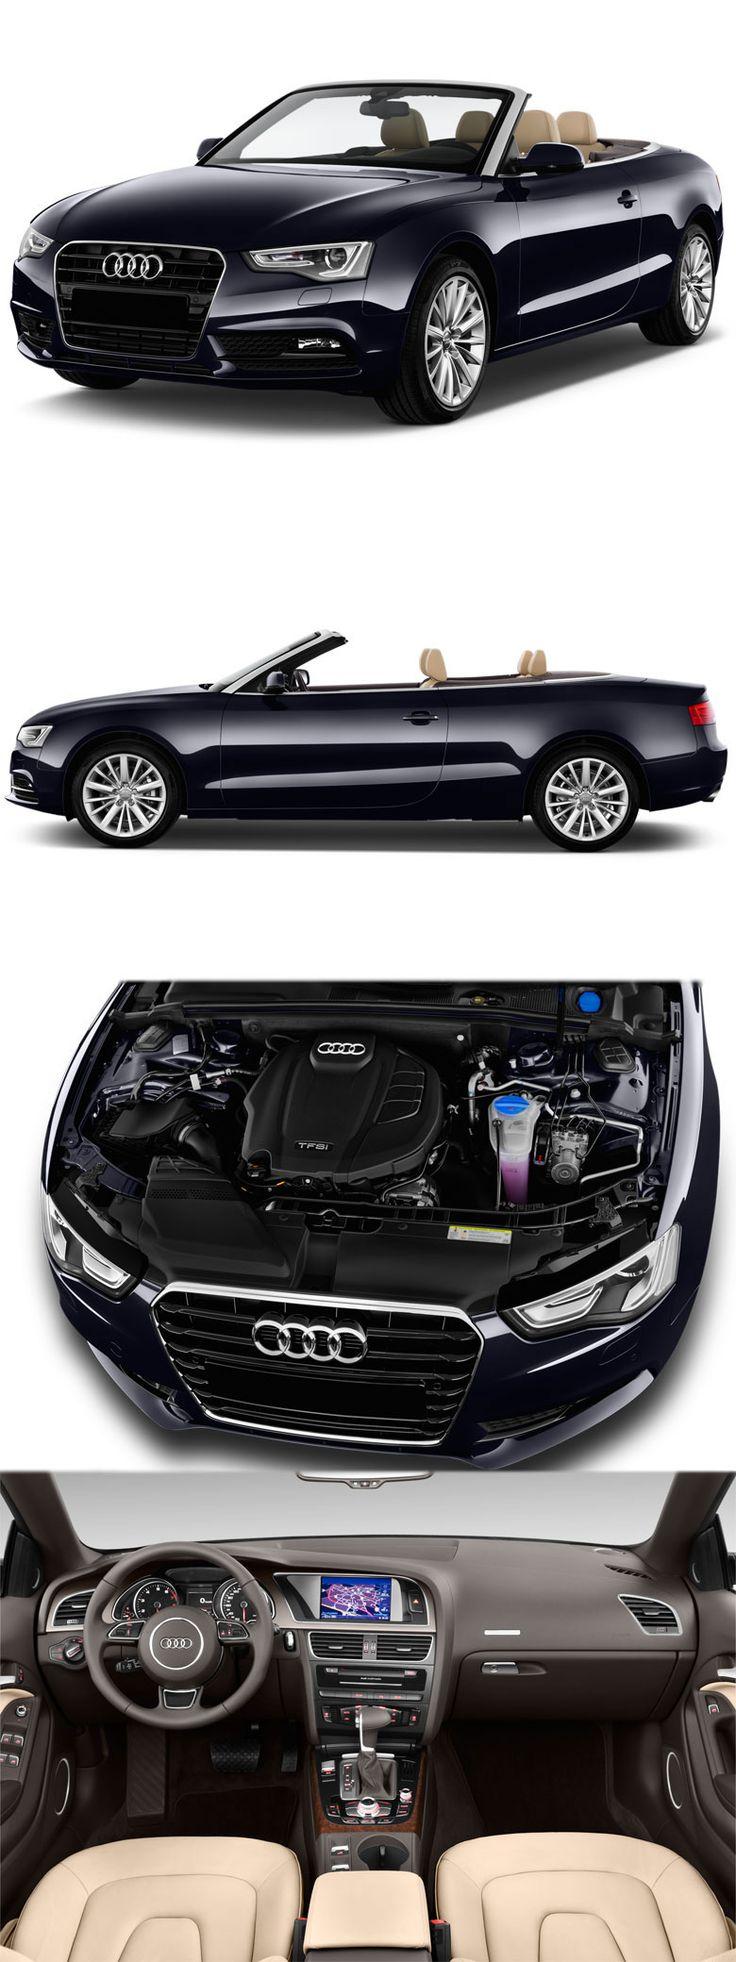 Audi A5 Cabriolet 2017 Reviewed For more details at: https://www.amazon.co.uk/Baby-Car-Mirror-Shatterproof-Installation/dp/B06XHG6SSY/ref=sr_1_2?ie=UTF8&qid=1499074433&sr=8-2&keywords=Kingseye